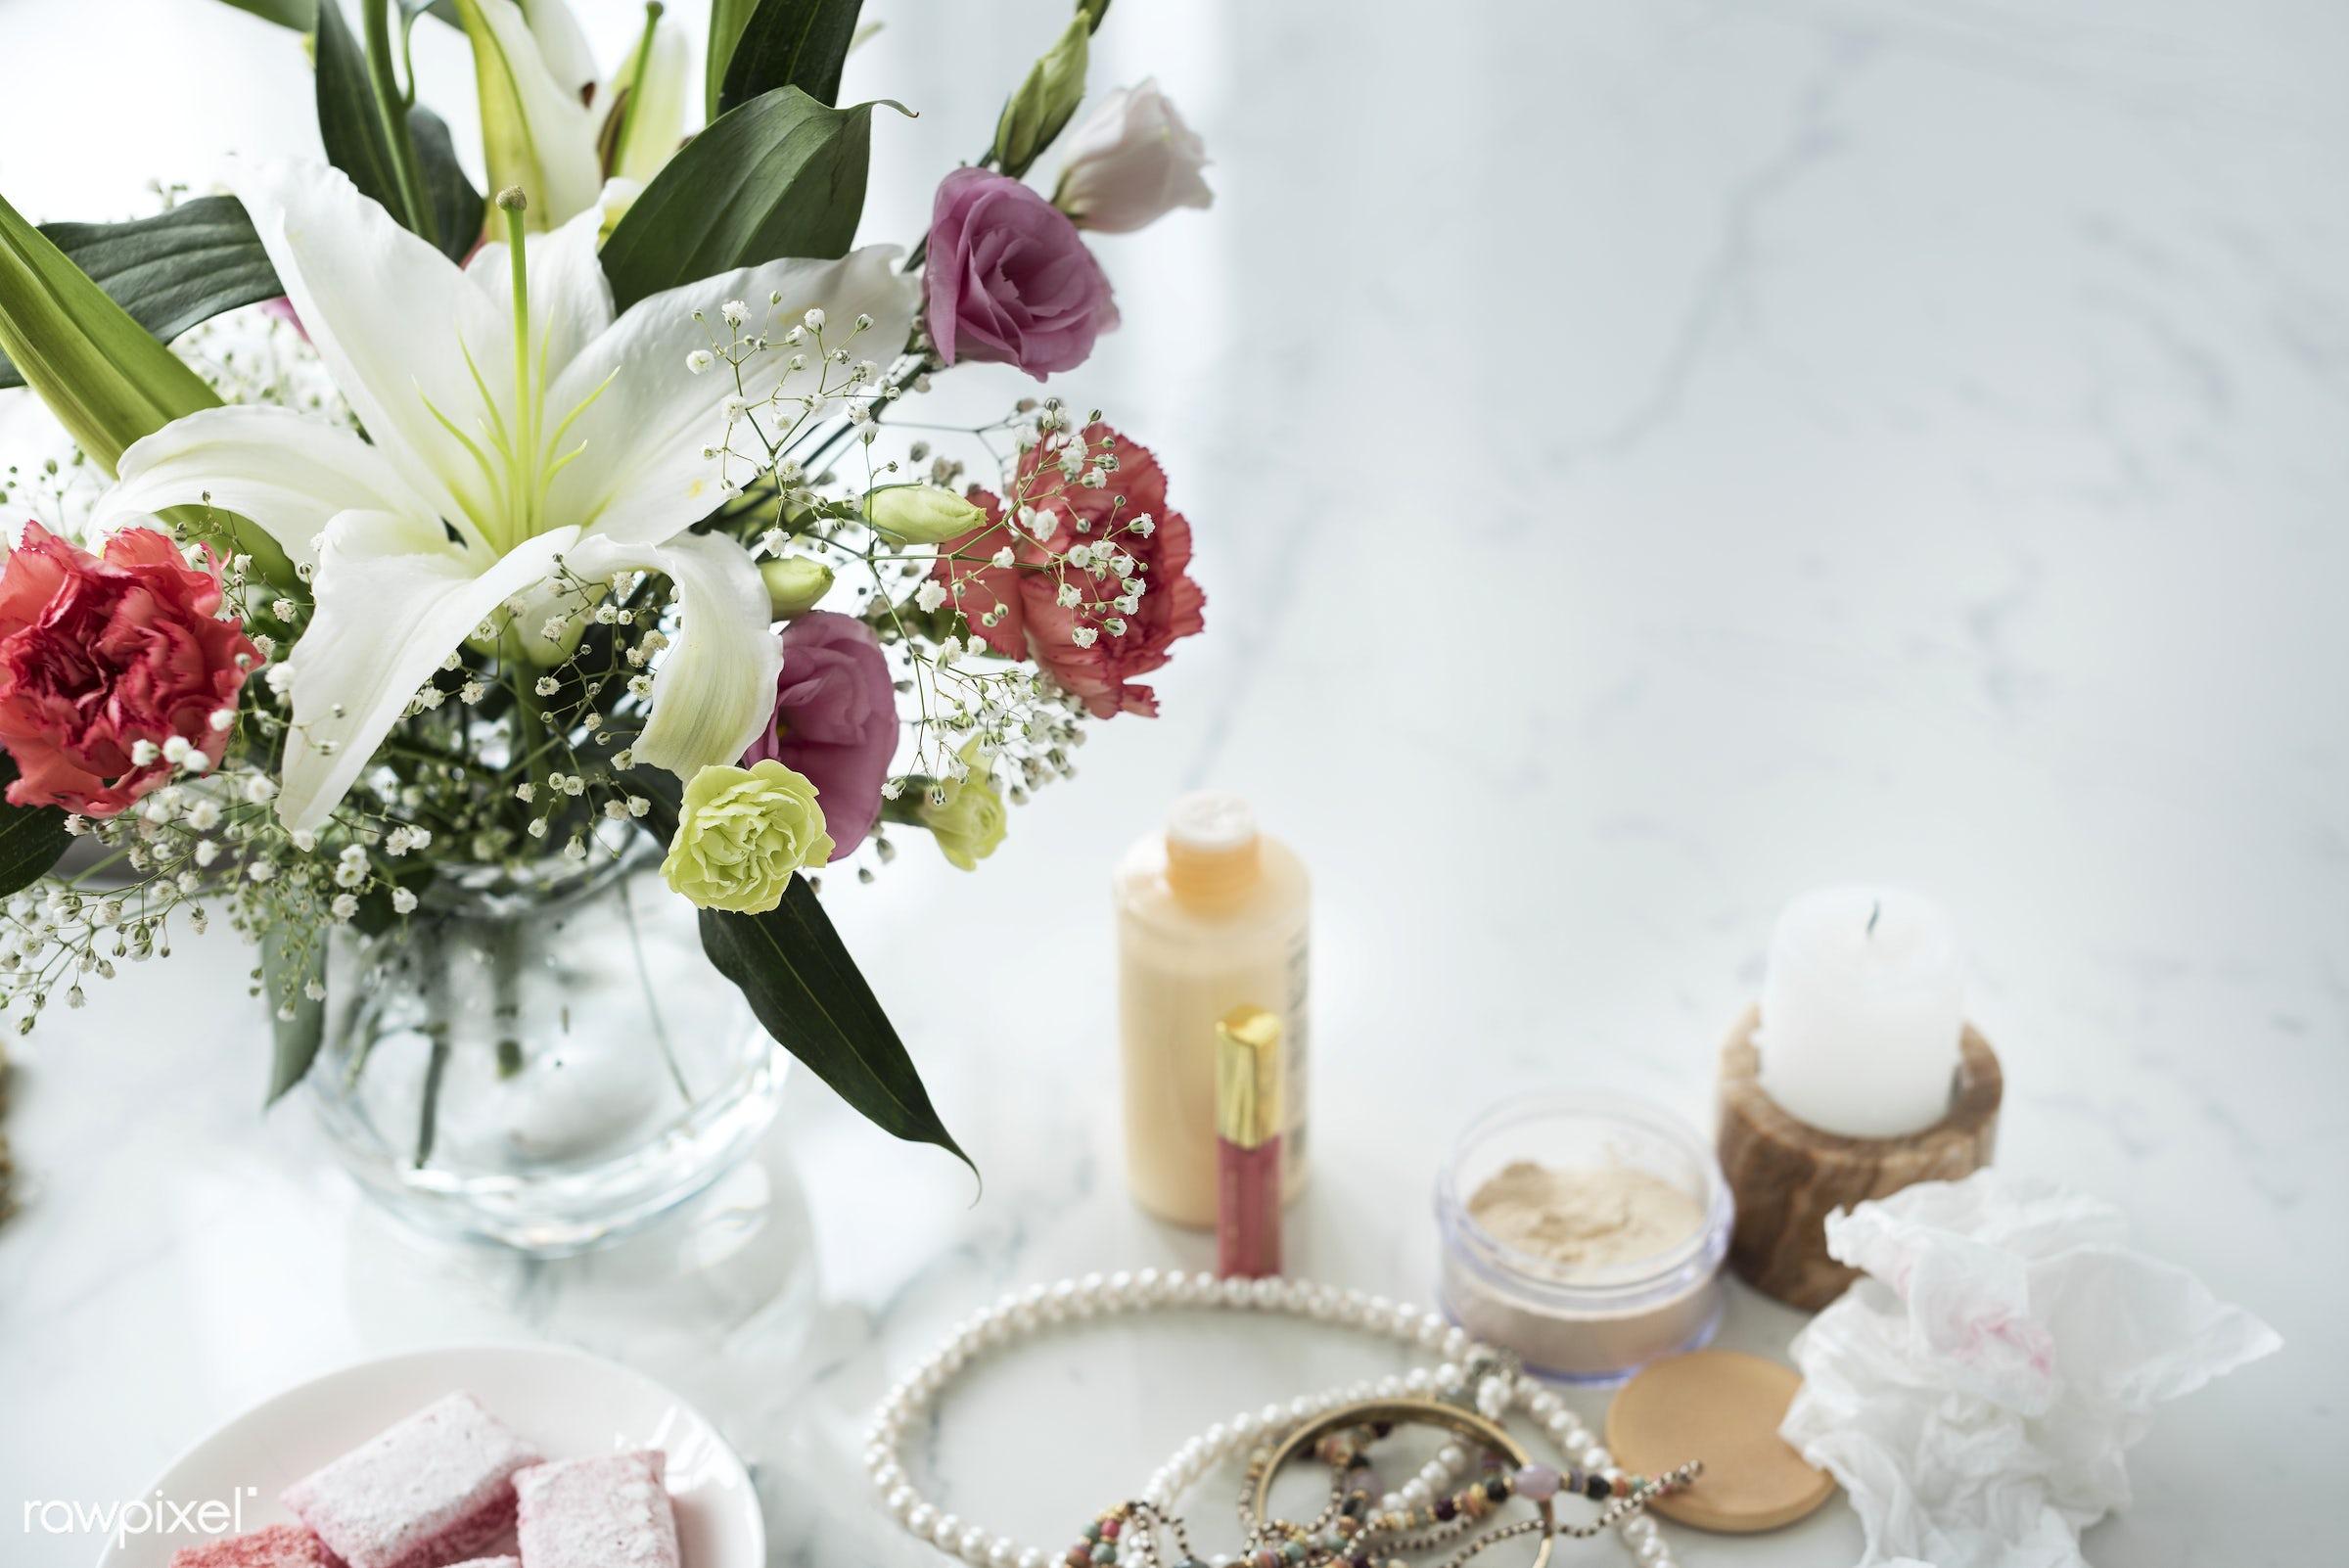 Woman cosmetics on marble table - box, cosmetics, cream, dessert, feminine, flowers, lotion, makeup, marble table, nobody,...